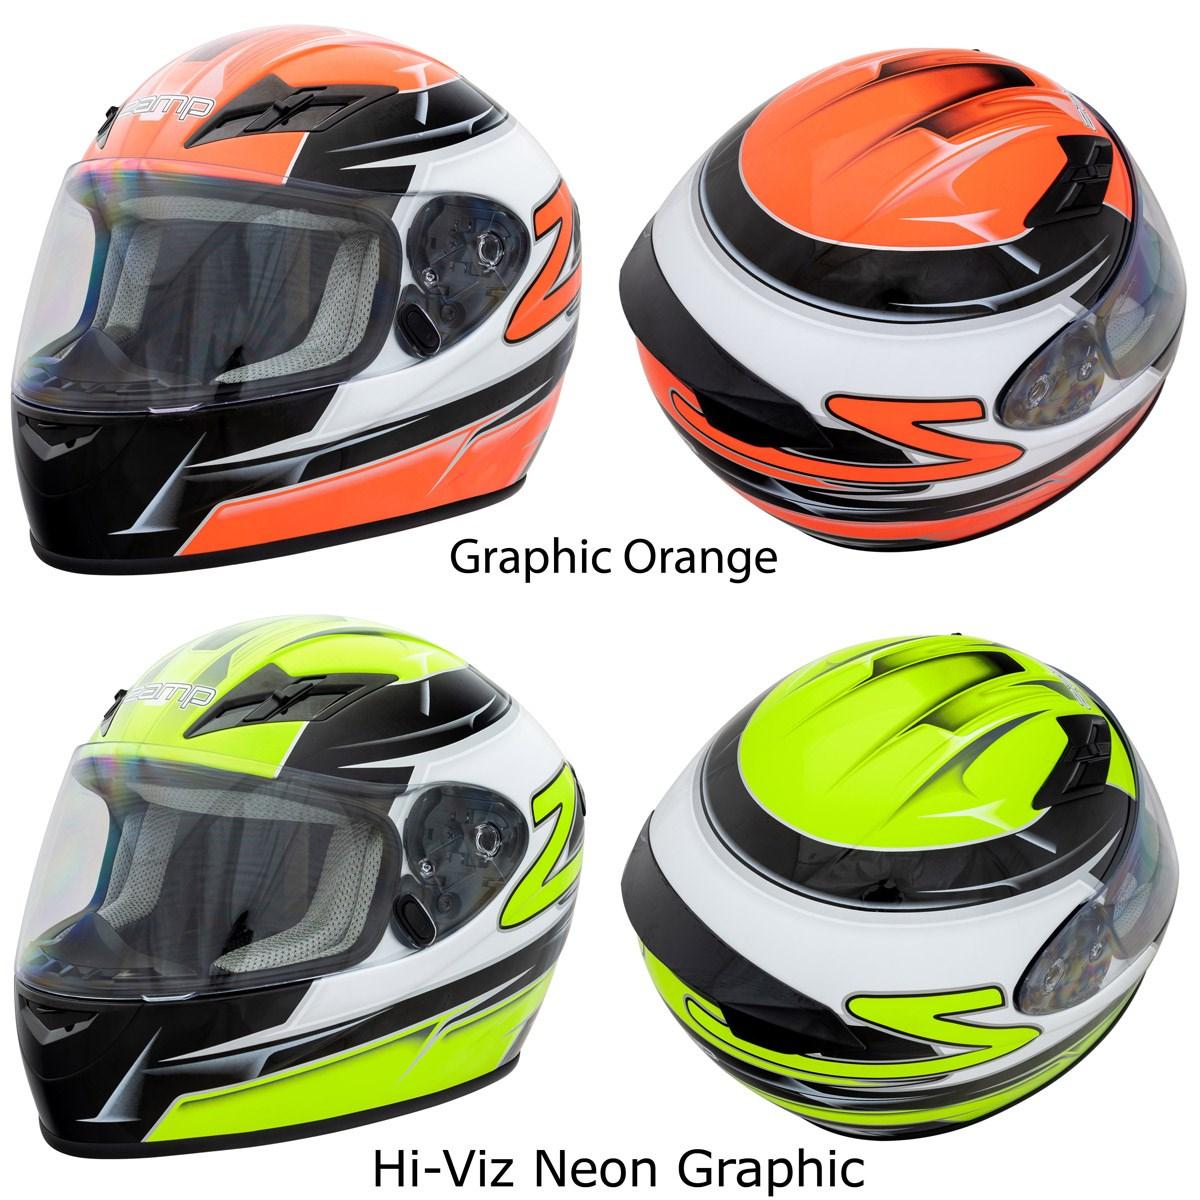 Zamp FS-8 Snell M2015 DOT Helmet Graphic Red//Black Large